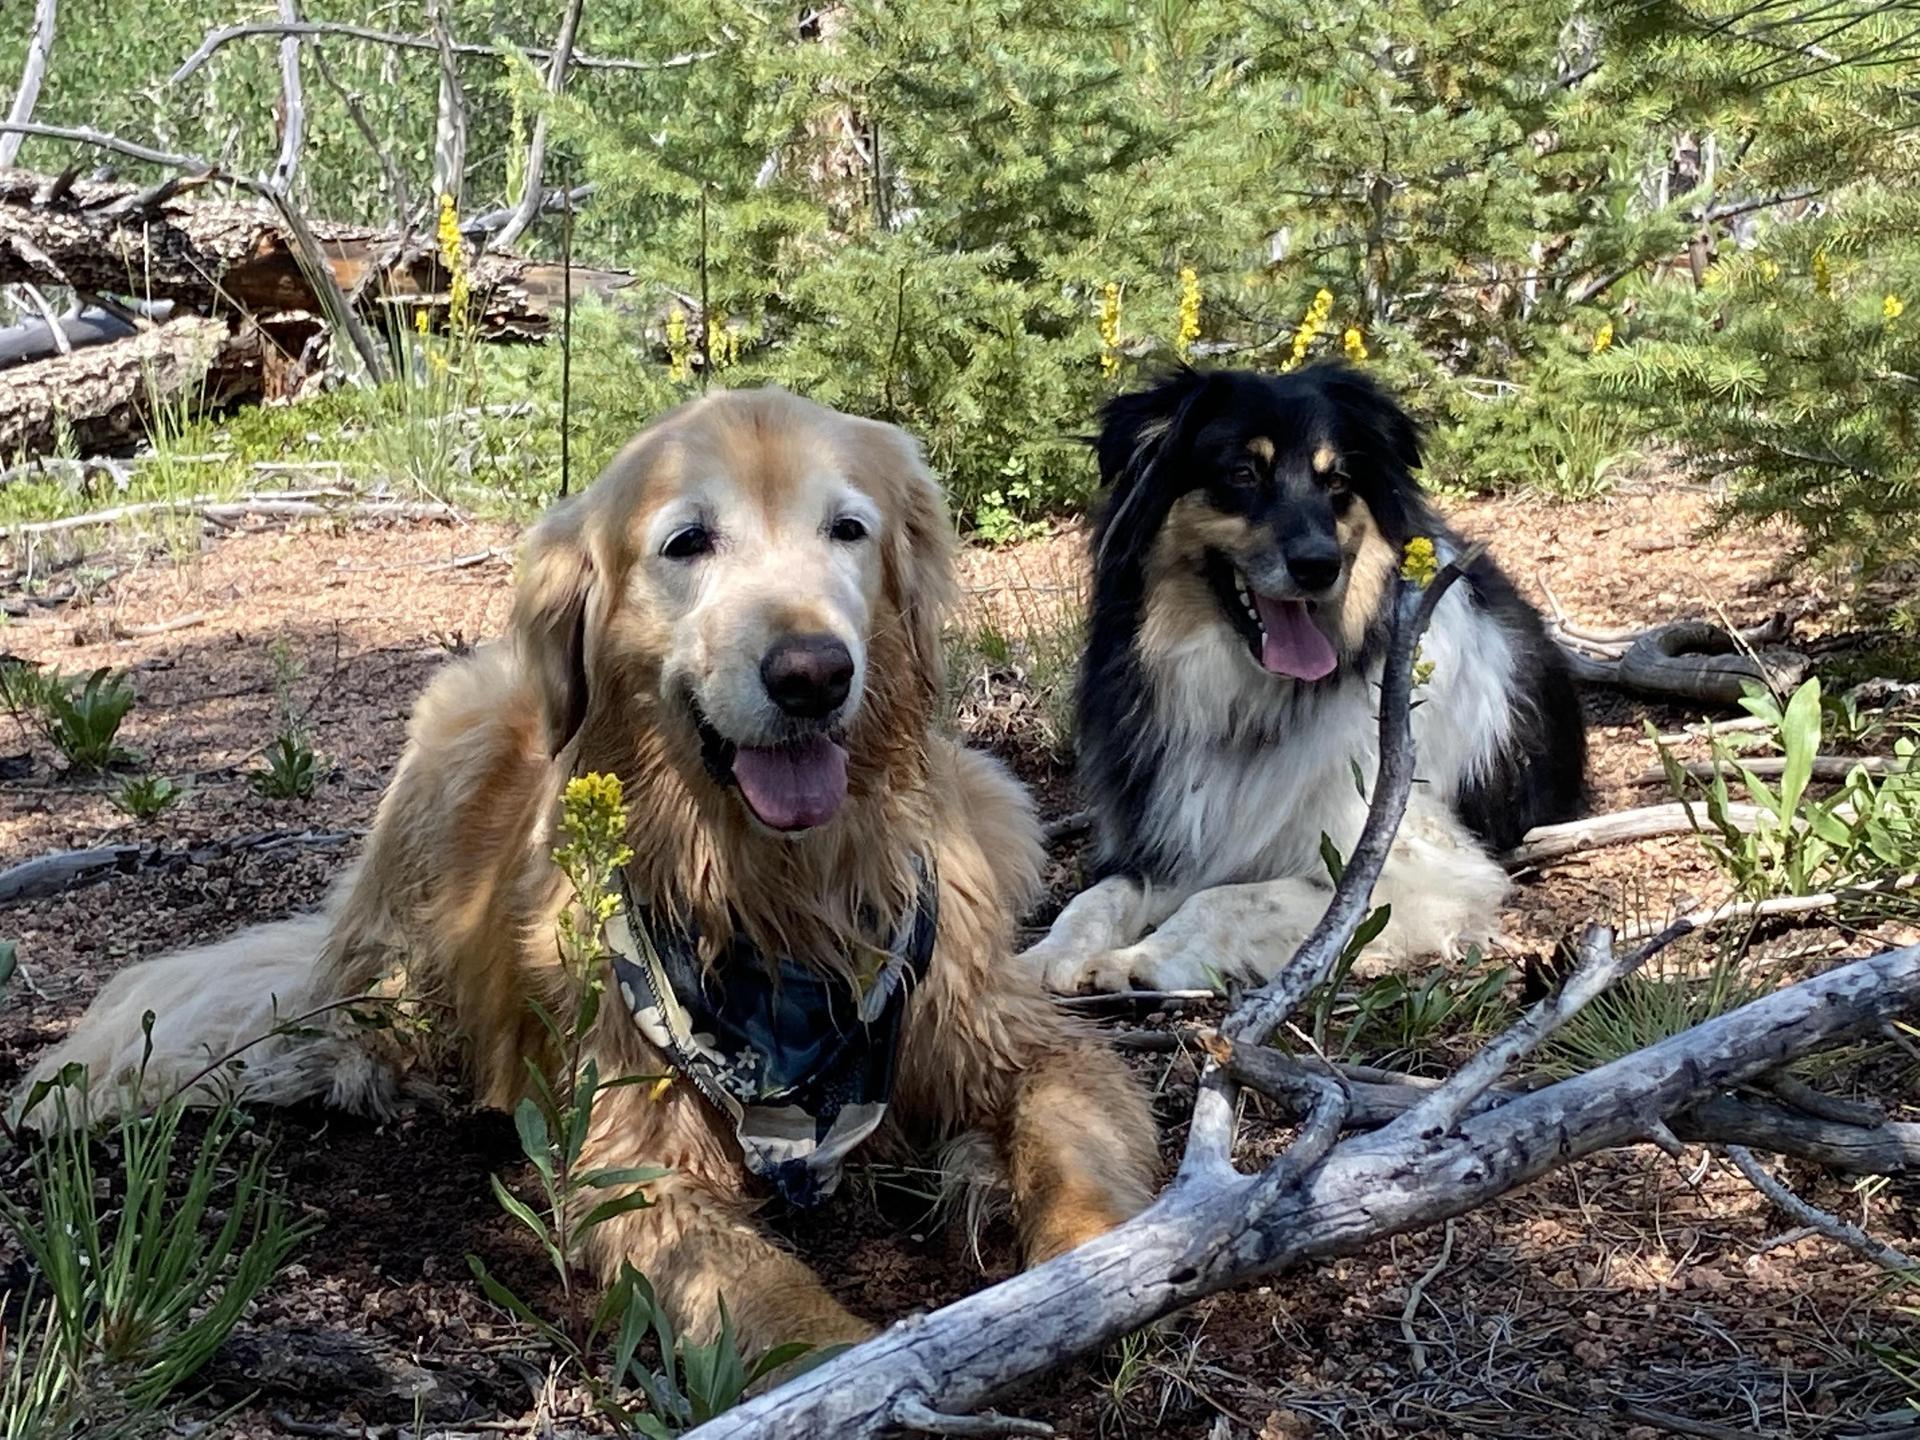 My dogs